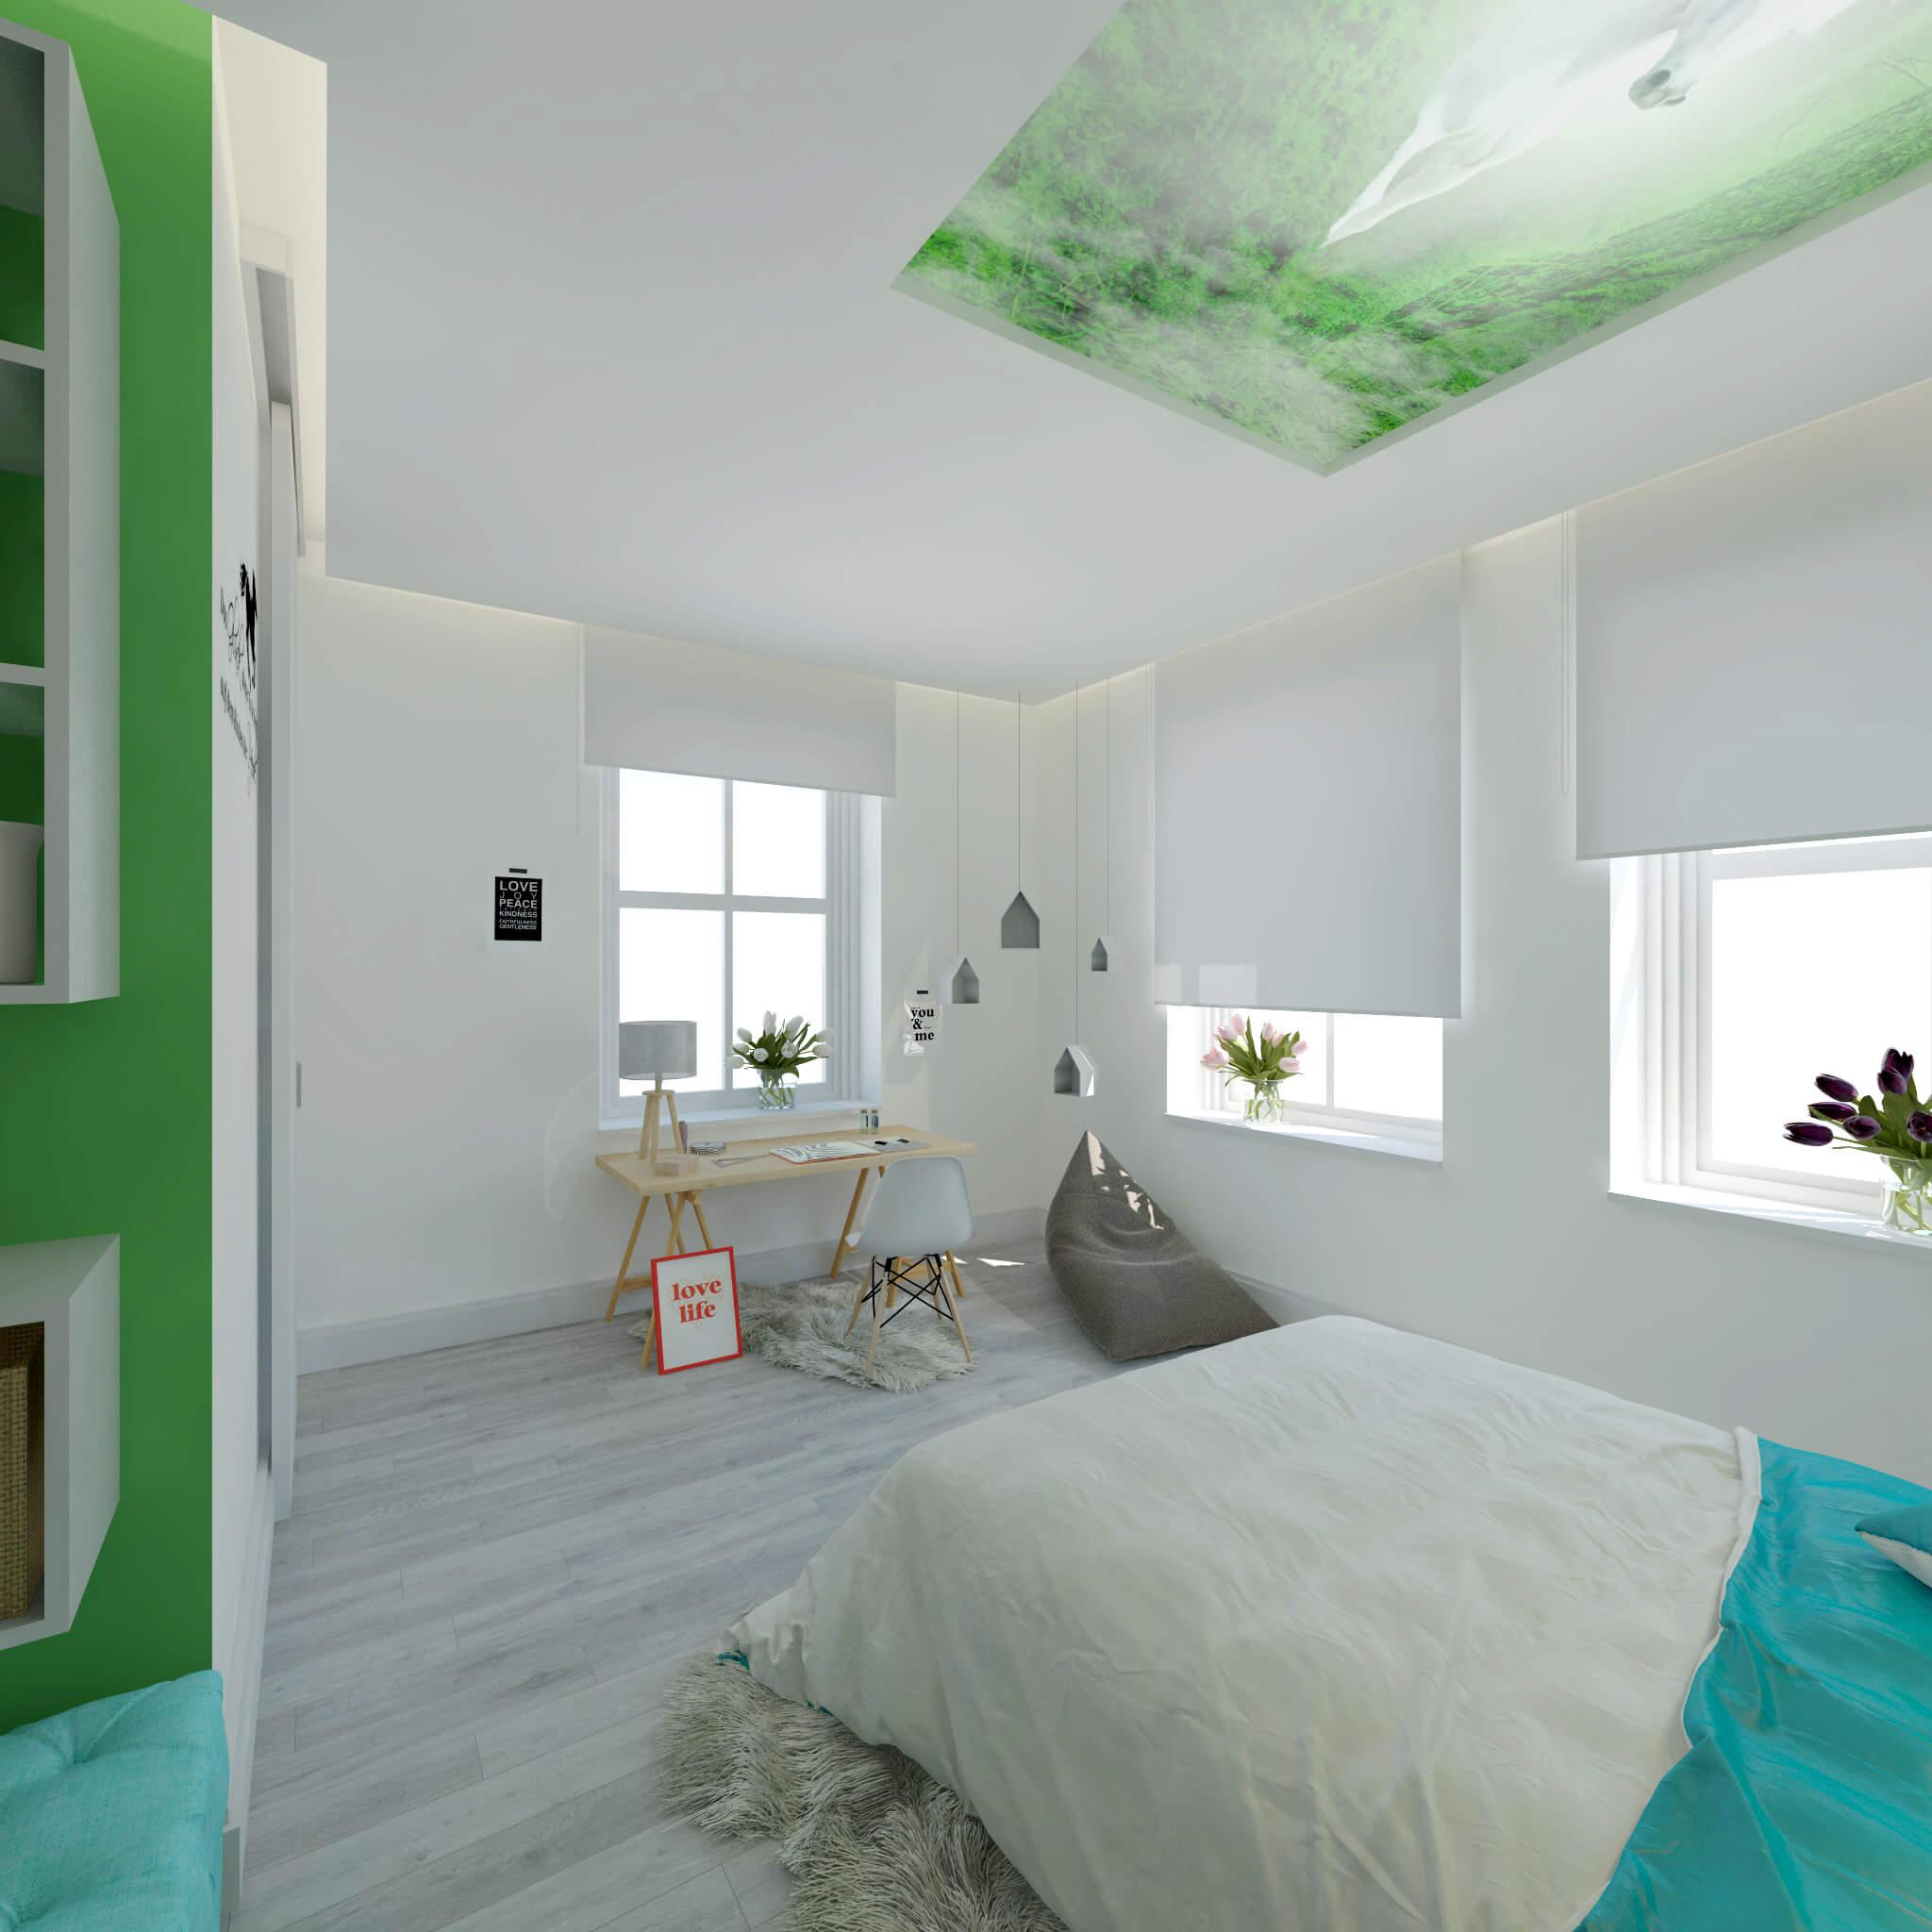 Jugendzimmer Design by Torsten Müller aus Bad Honnef nähe Köln Bonn Verkauf Beratung Planung Interior Designer 3D Lifestyle- (6)